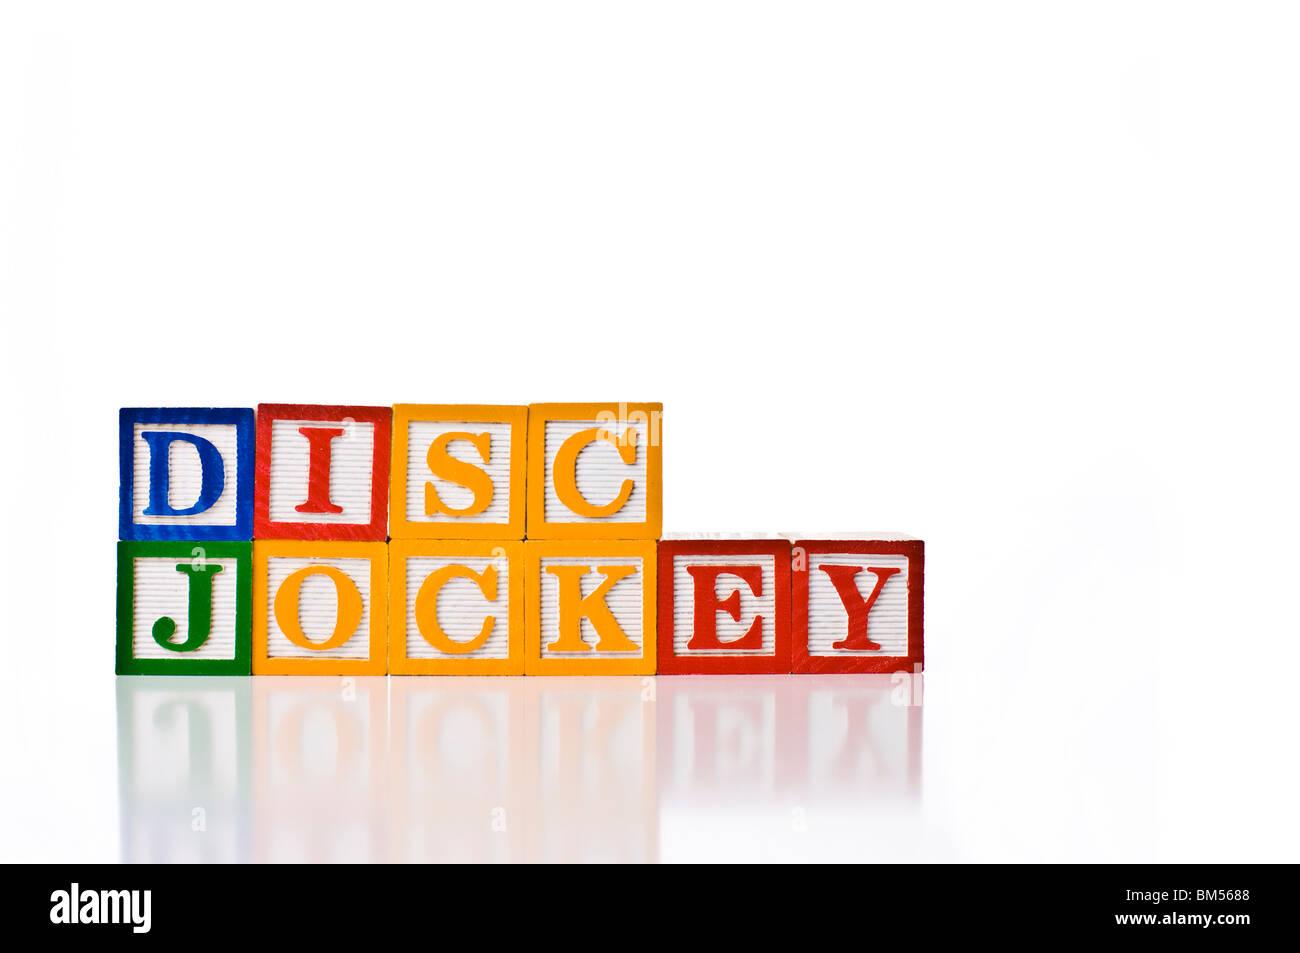 Colorful children's blocks spelling DISC JOCKEY - Stock Image